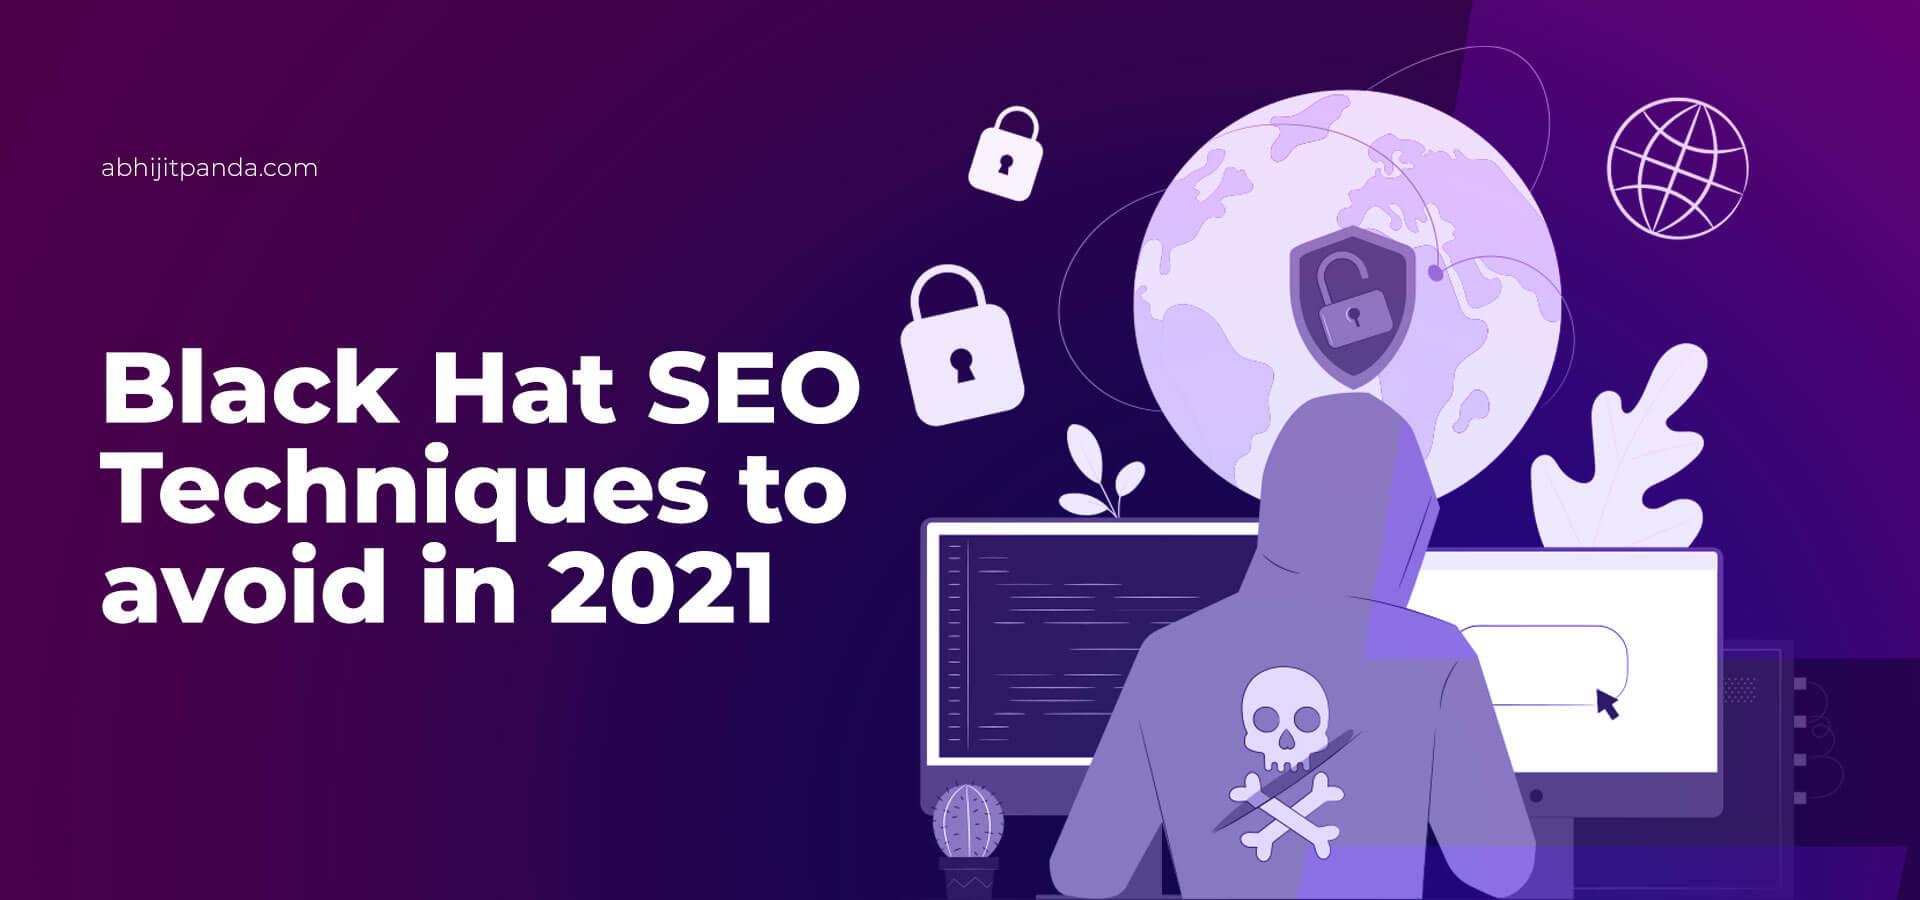 Black Hat SEO Technologies to Avoid in 2021